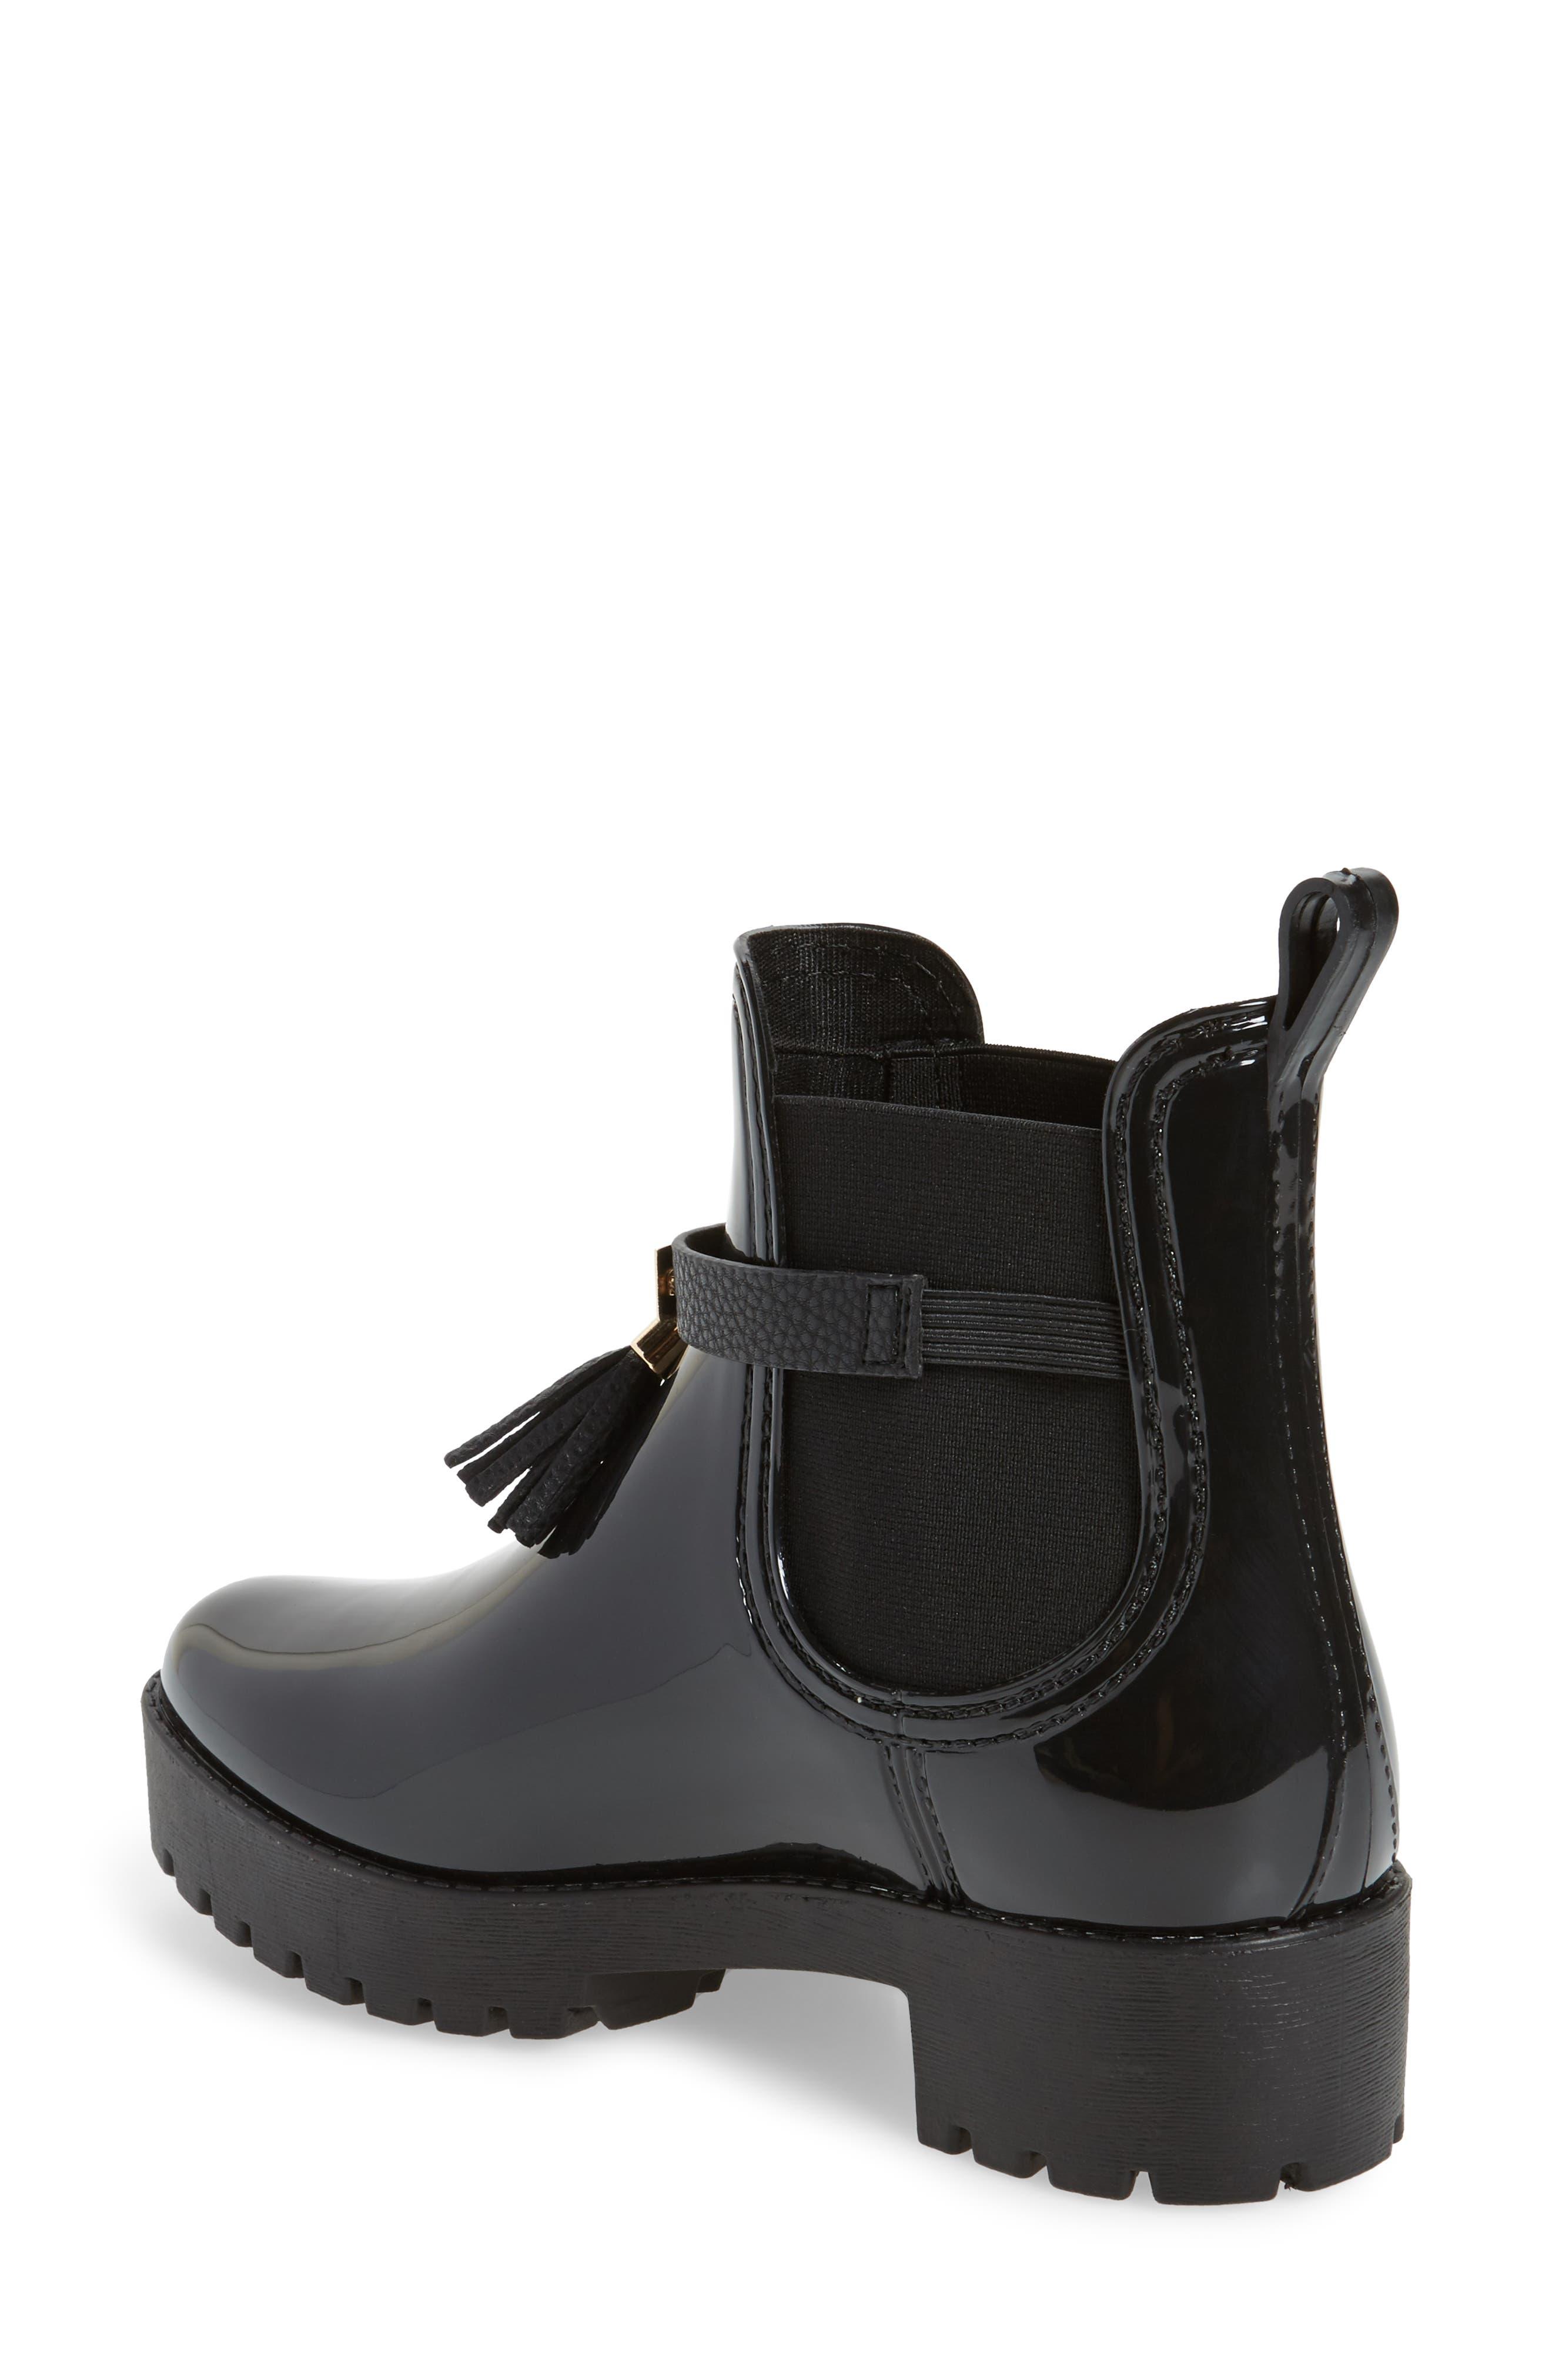 Alternate Image 2  - däv Leeds Tassel Waterproof Chelsea Boot (Women)